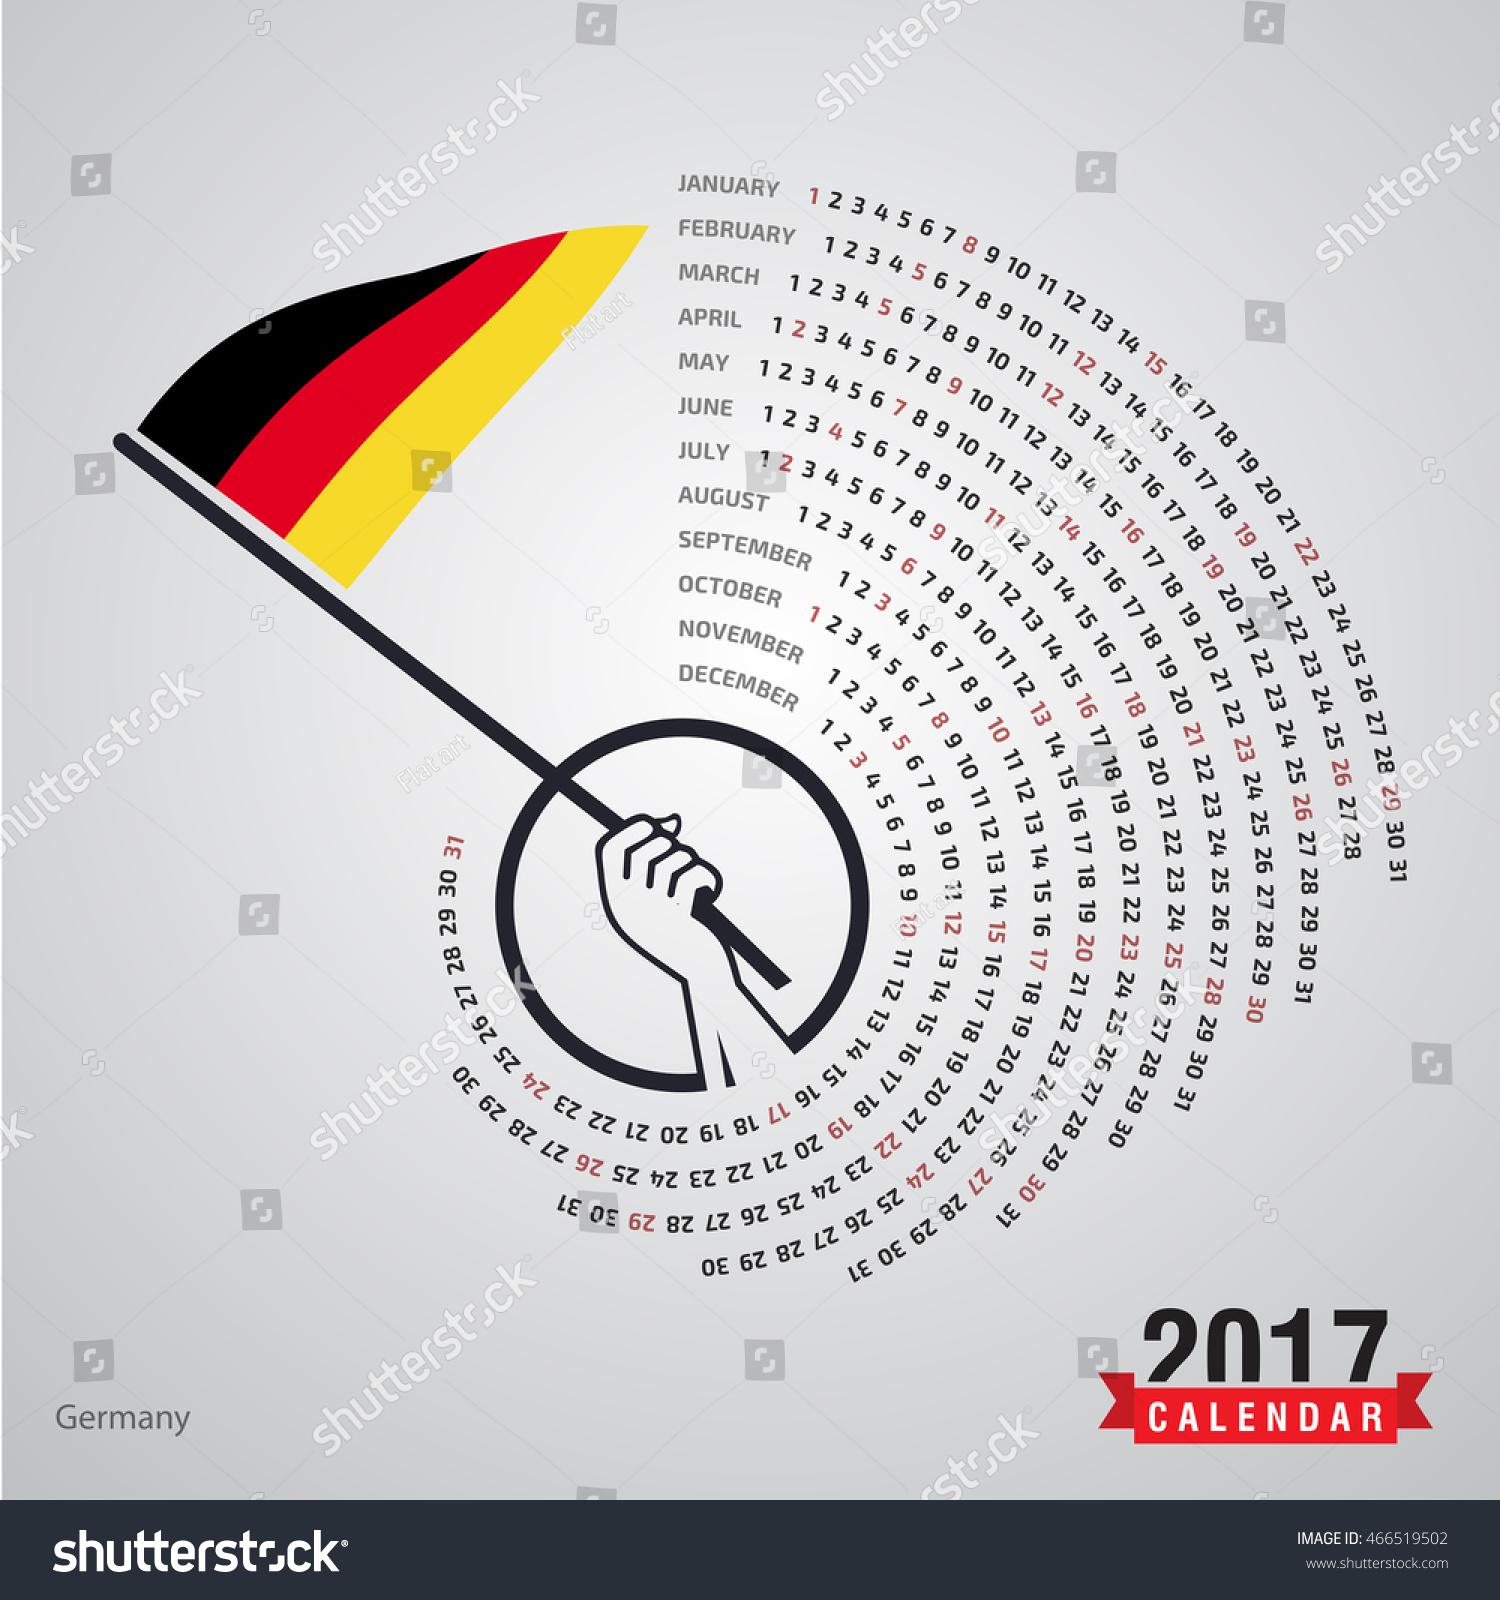 Year Calendar Germany : Calendar germany country waving flag stock vector